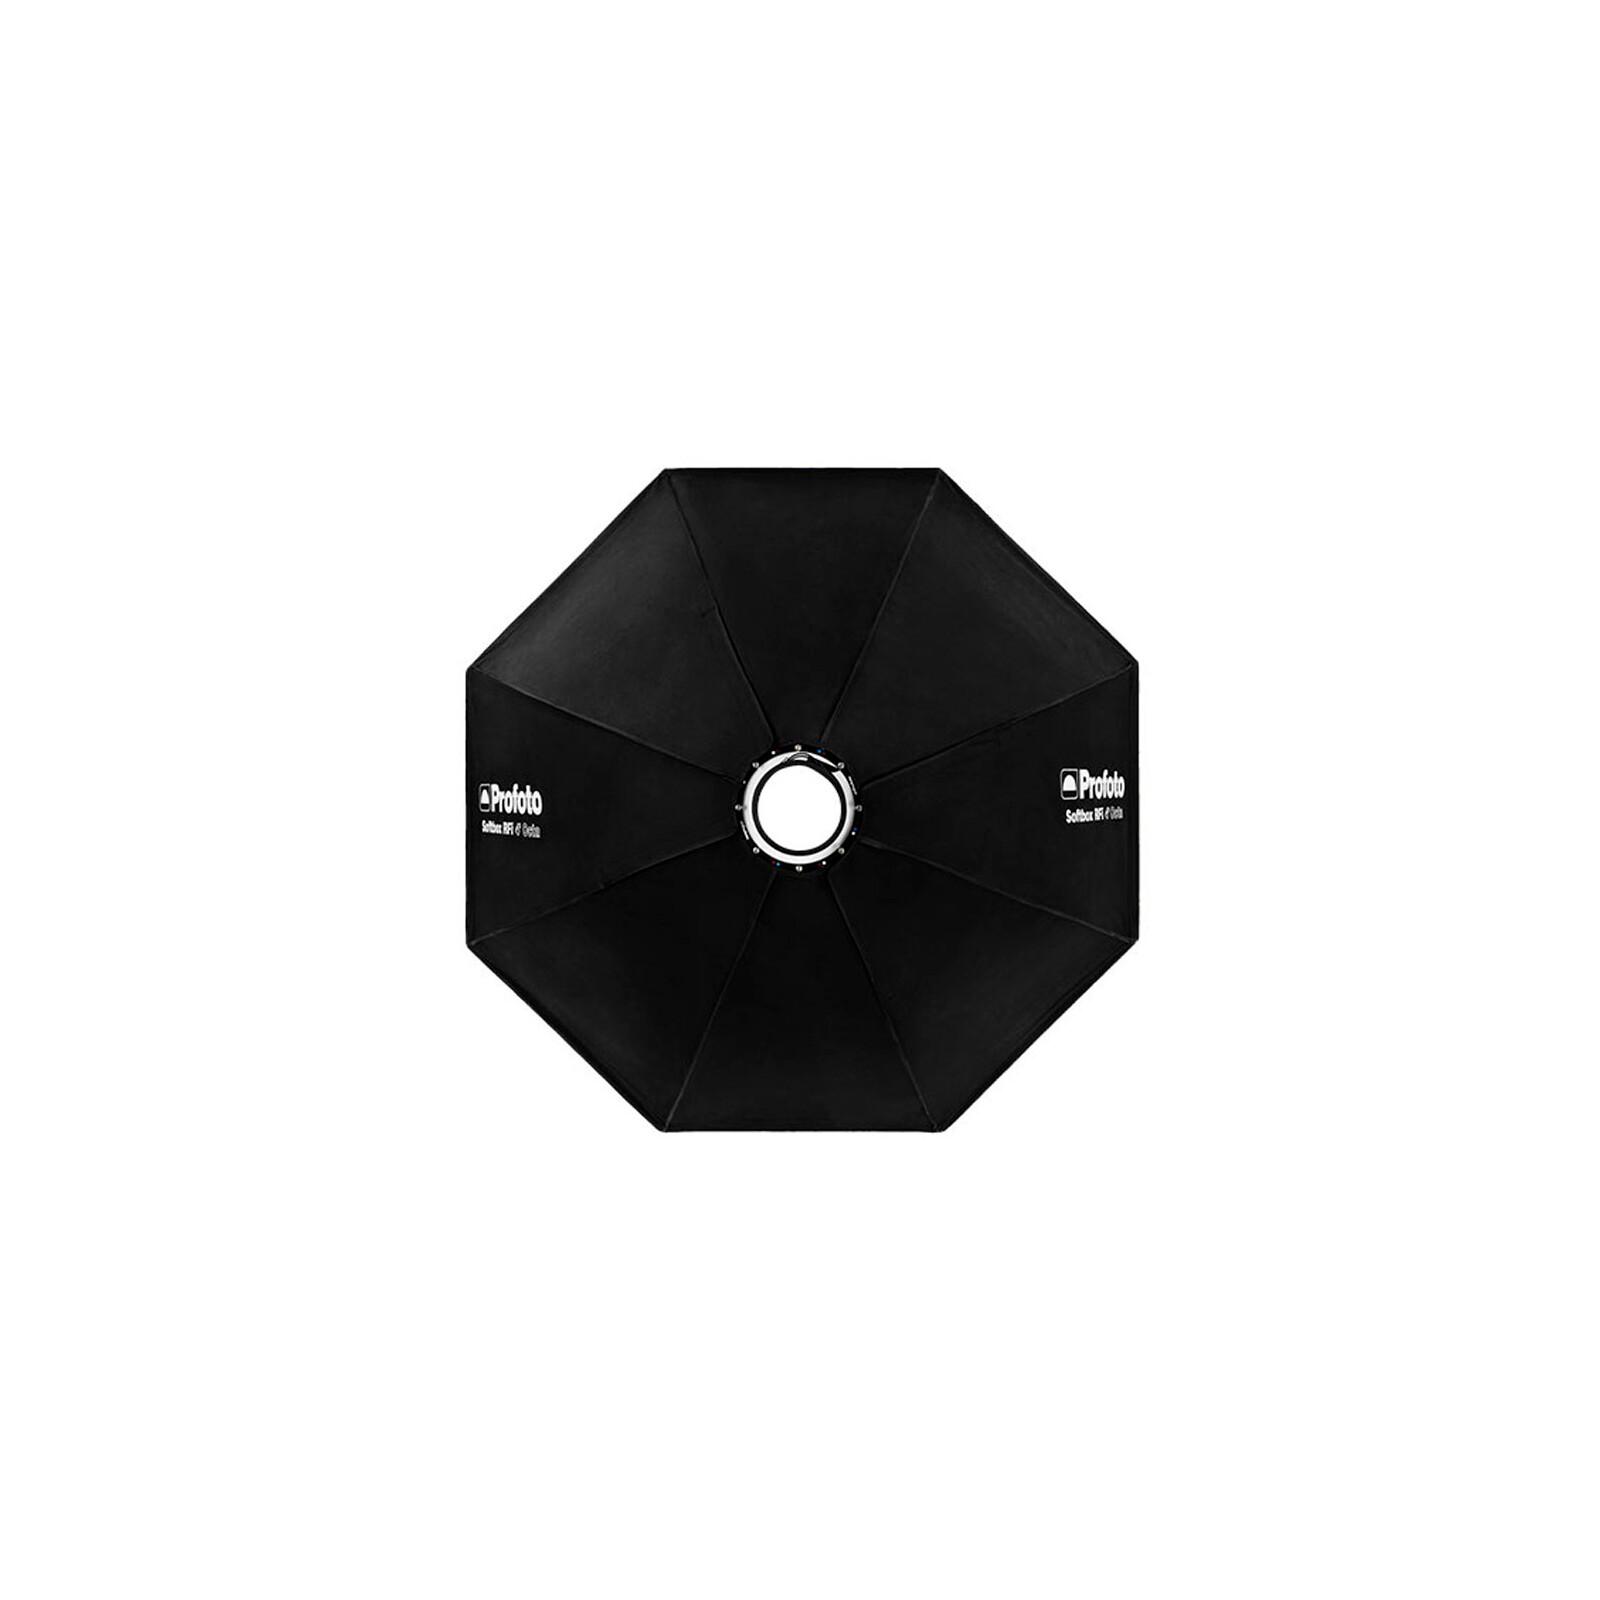 Profoto RFI Softbox Octa 120cm